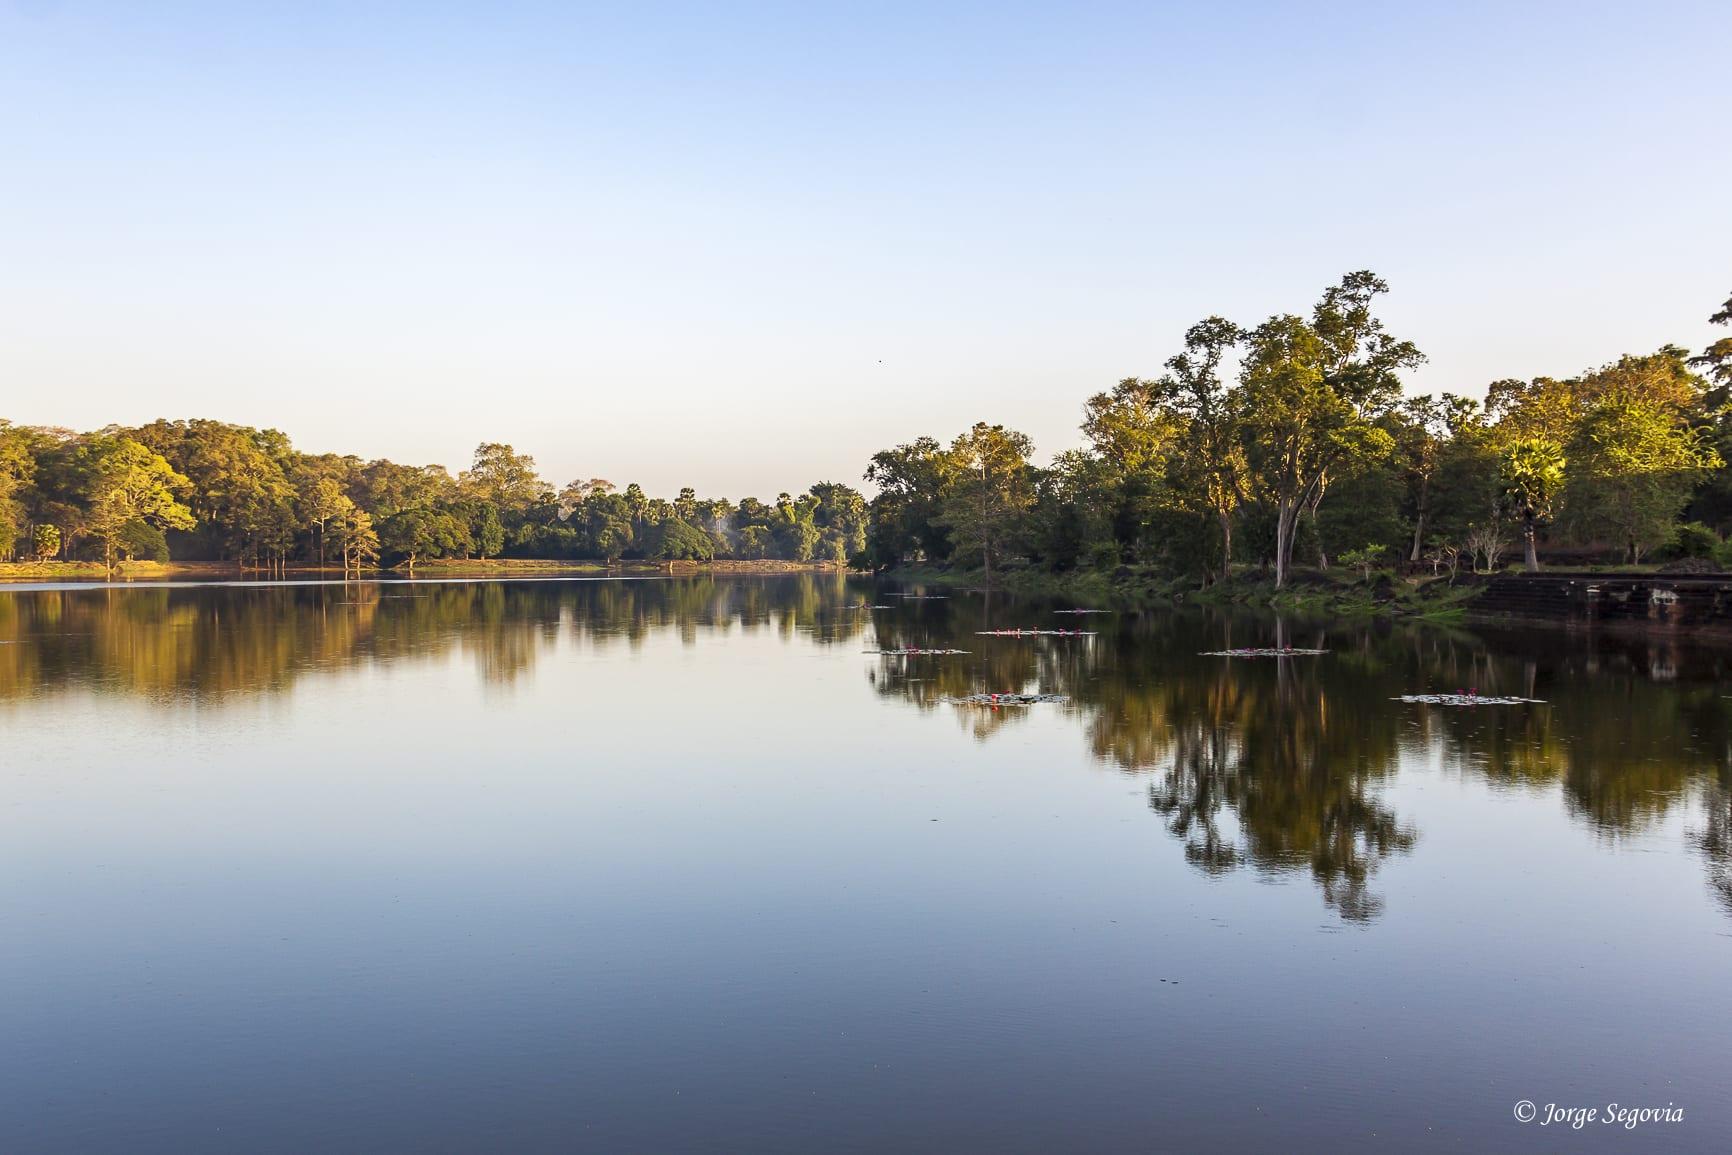 Canal de Angkor Wat: amanecer